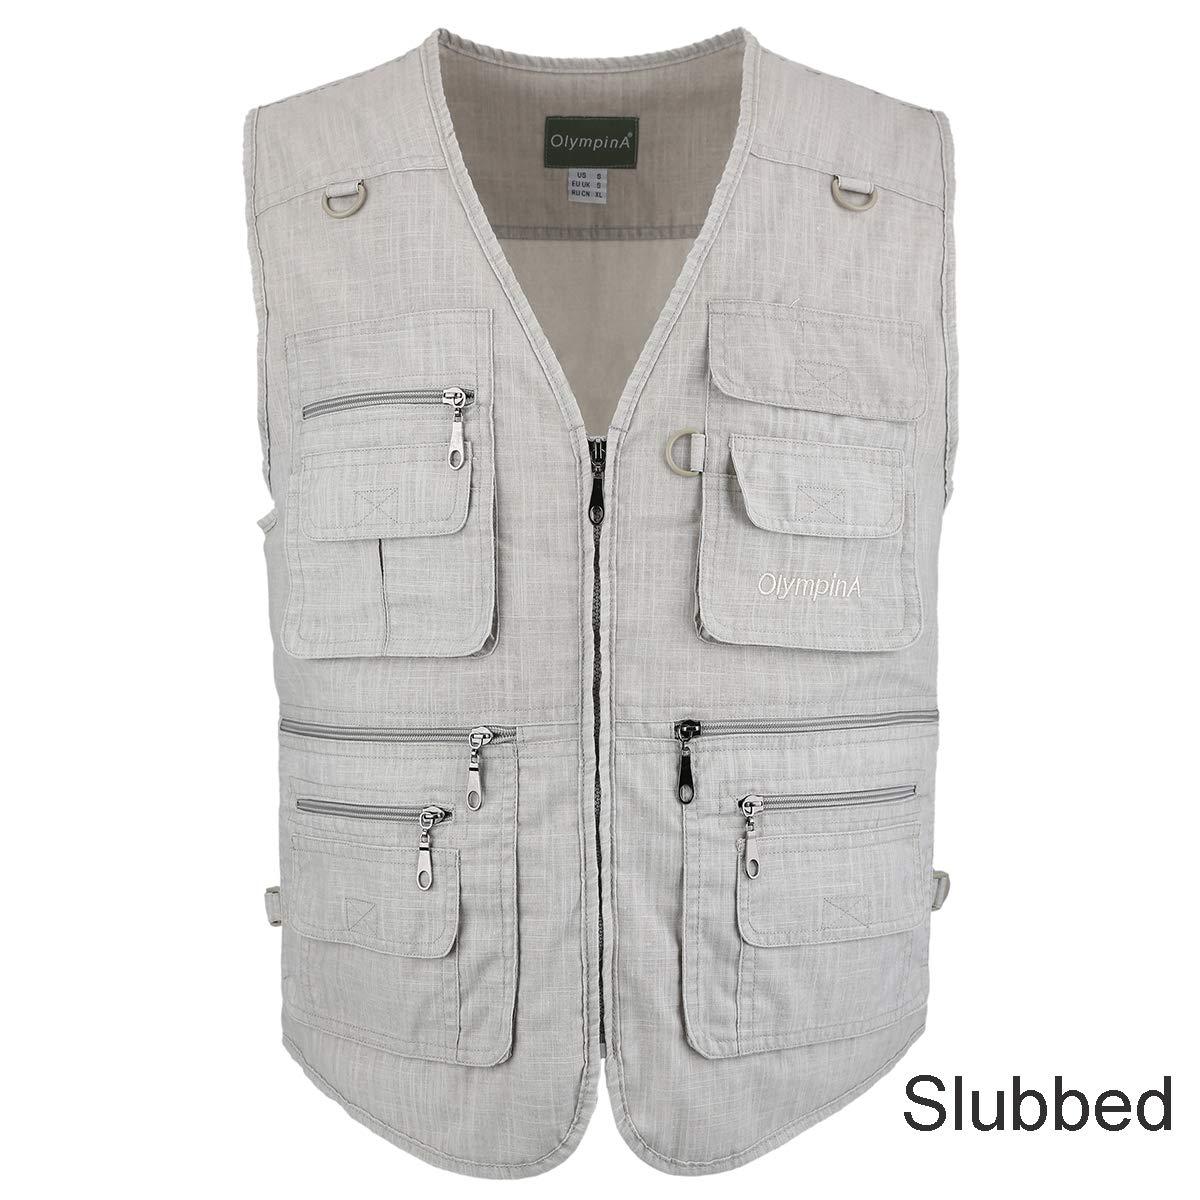 LUSI MADAM Men's Outdoors Travel Sports Pockets Vest (Beige Slubbed, US S/Asia XL)